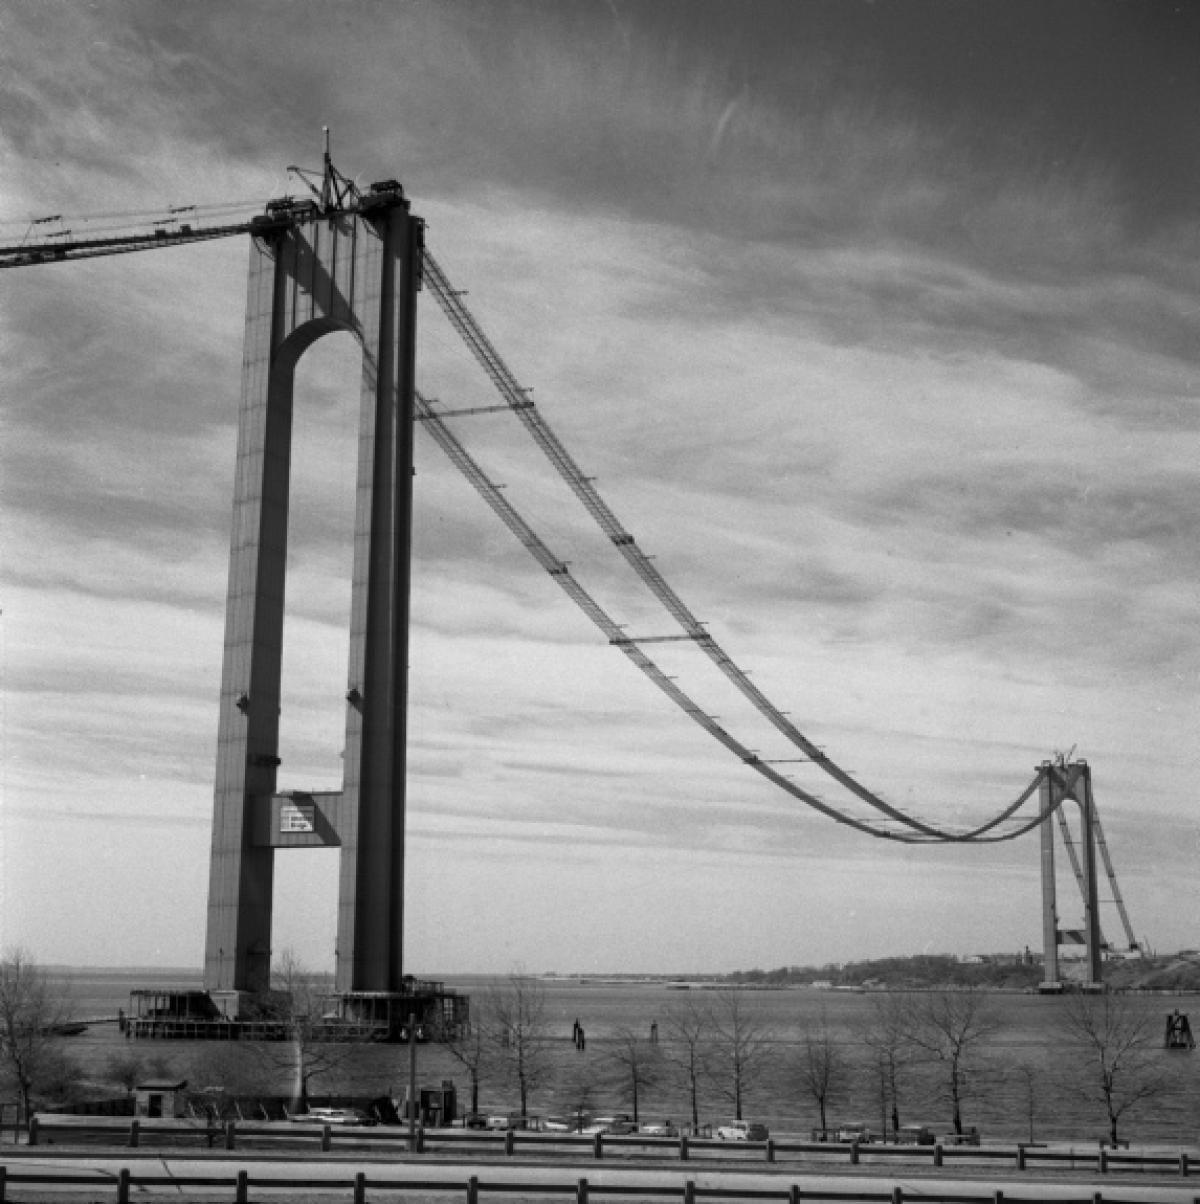 Brooklyn Staten Island Car: Verrazano-Narrows Bridge, 1963